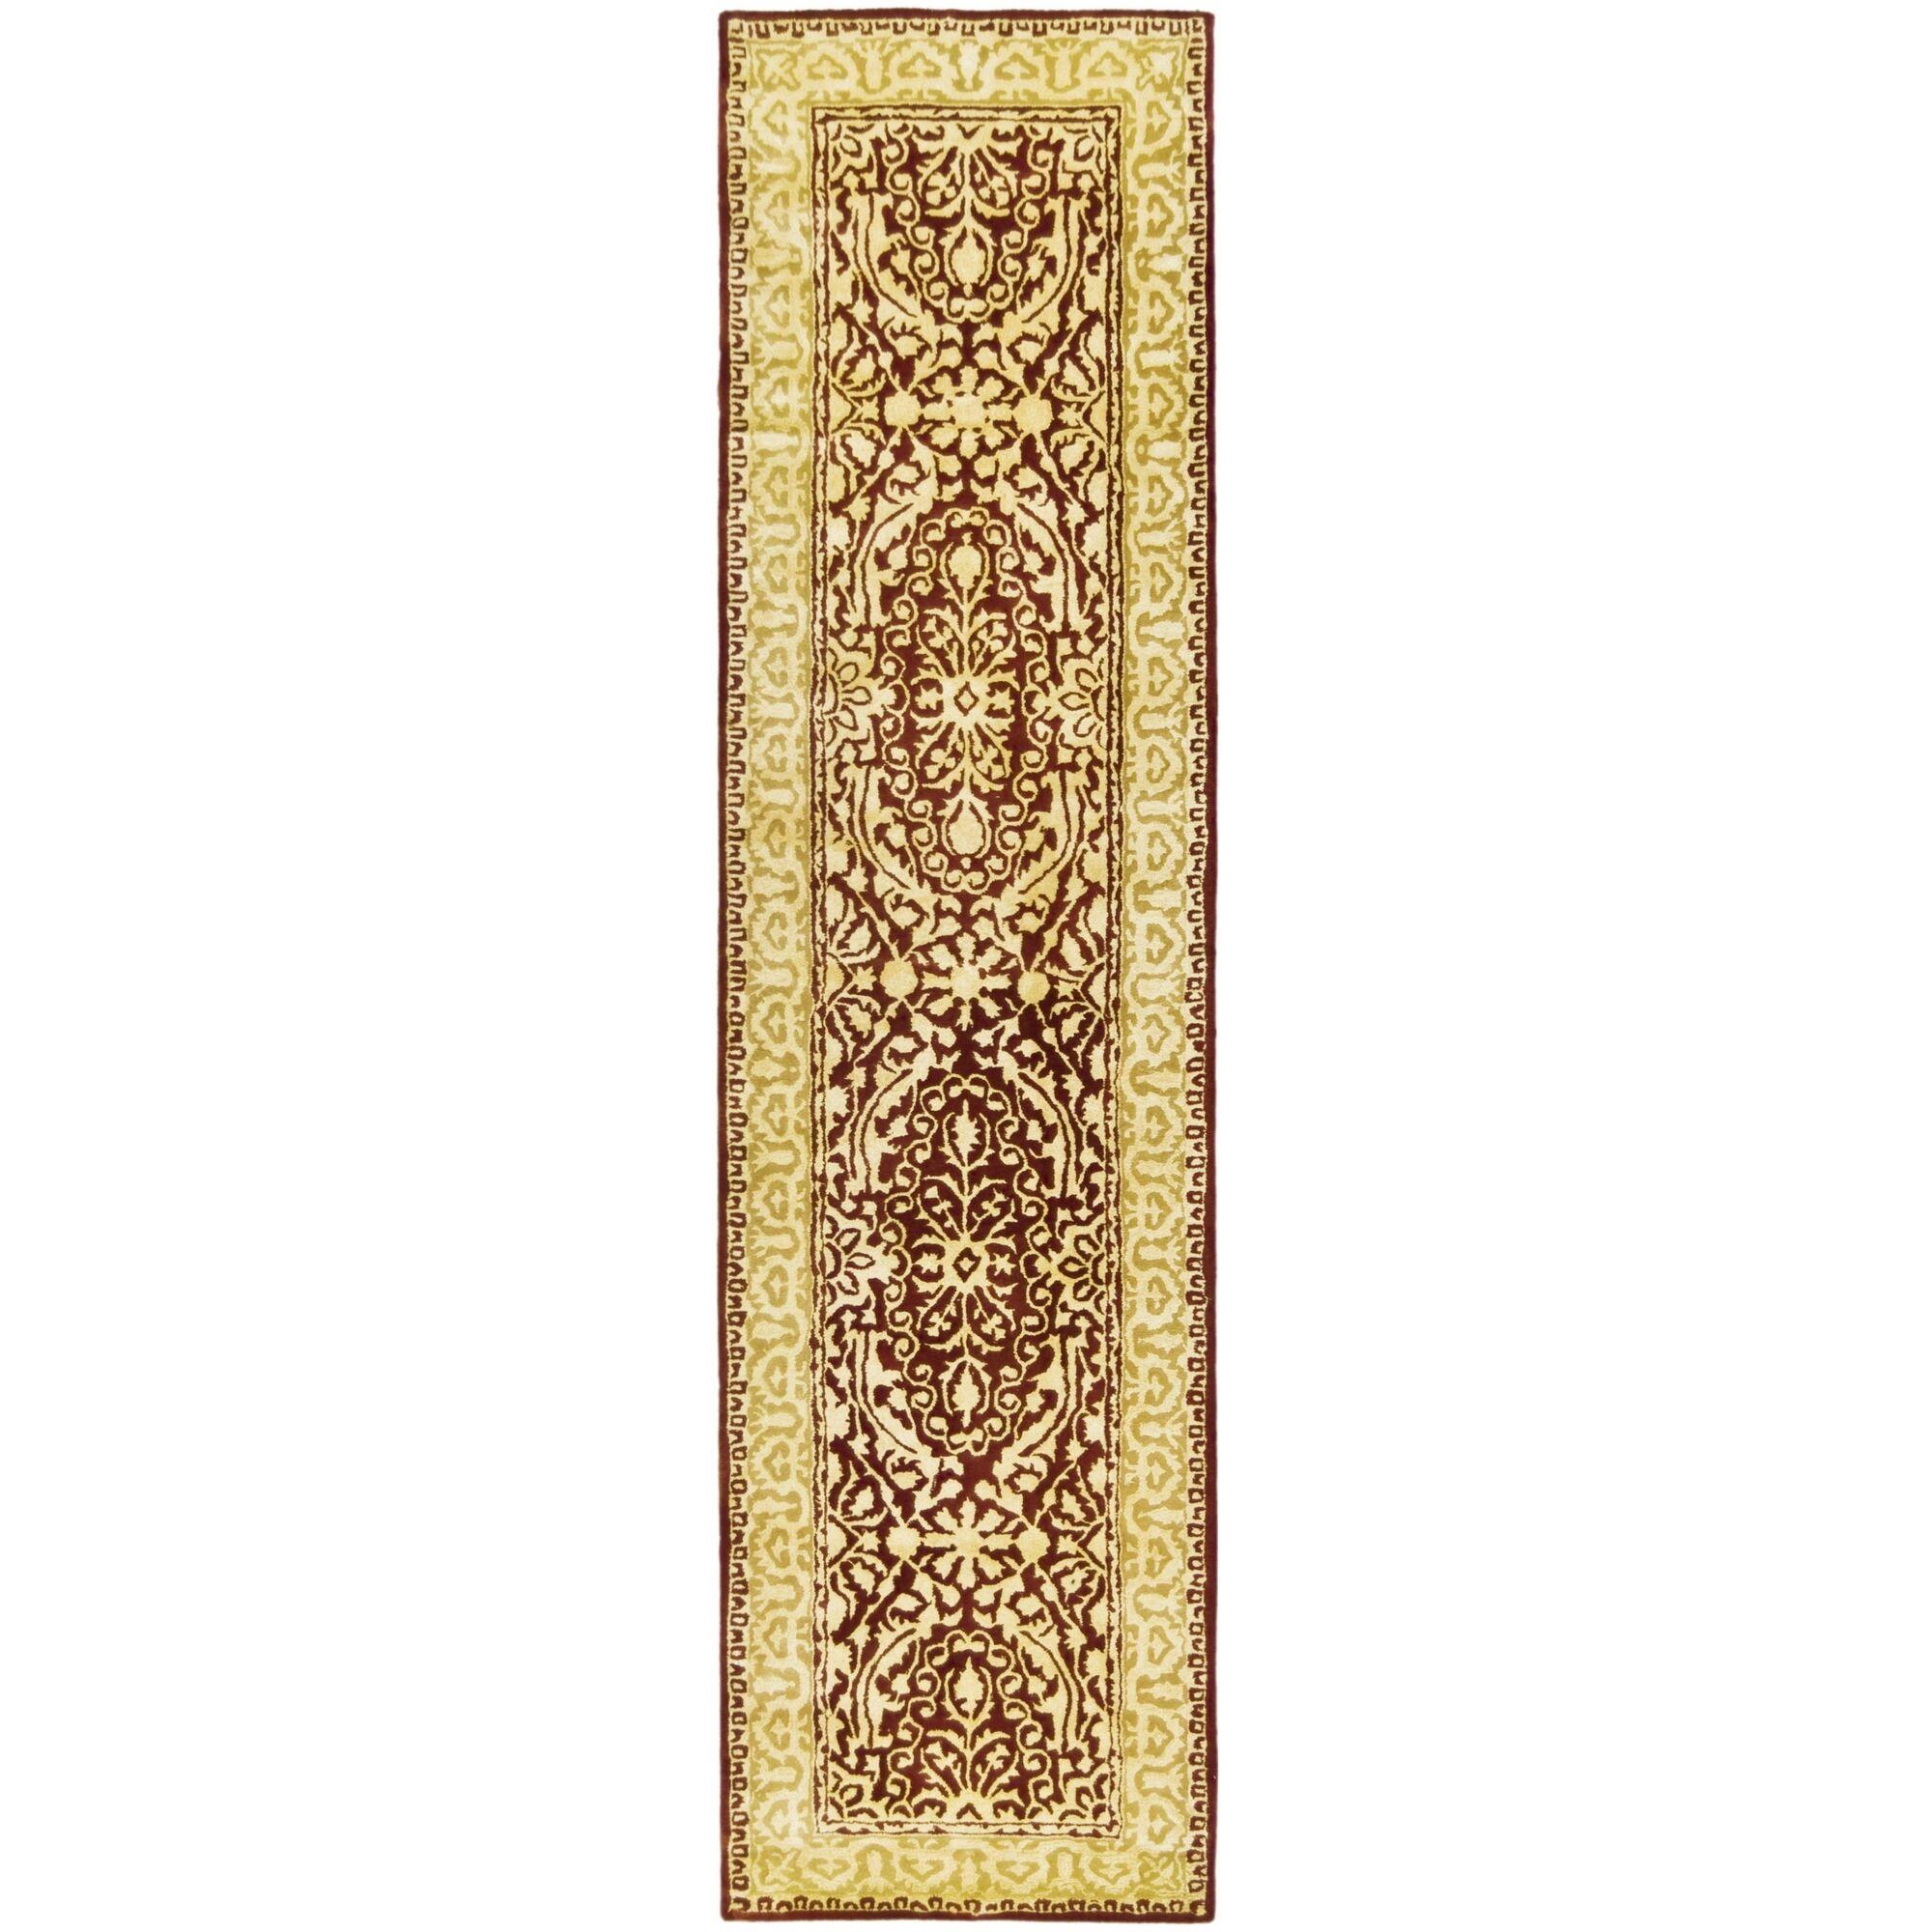 Sik Road Maroom/Ivory Area Rug Rug Size: Runner 2'6